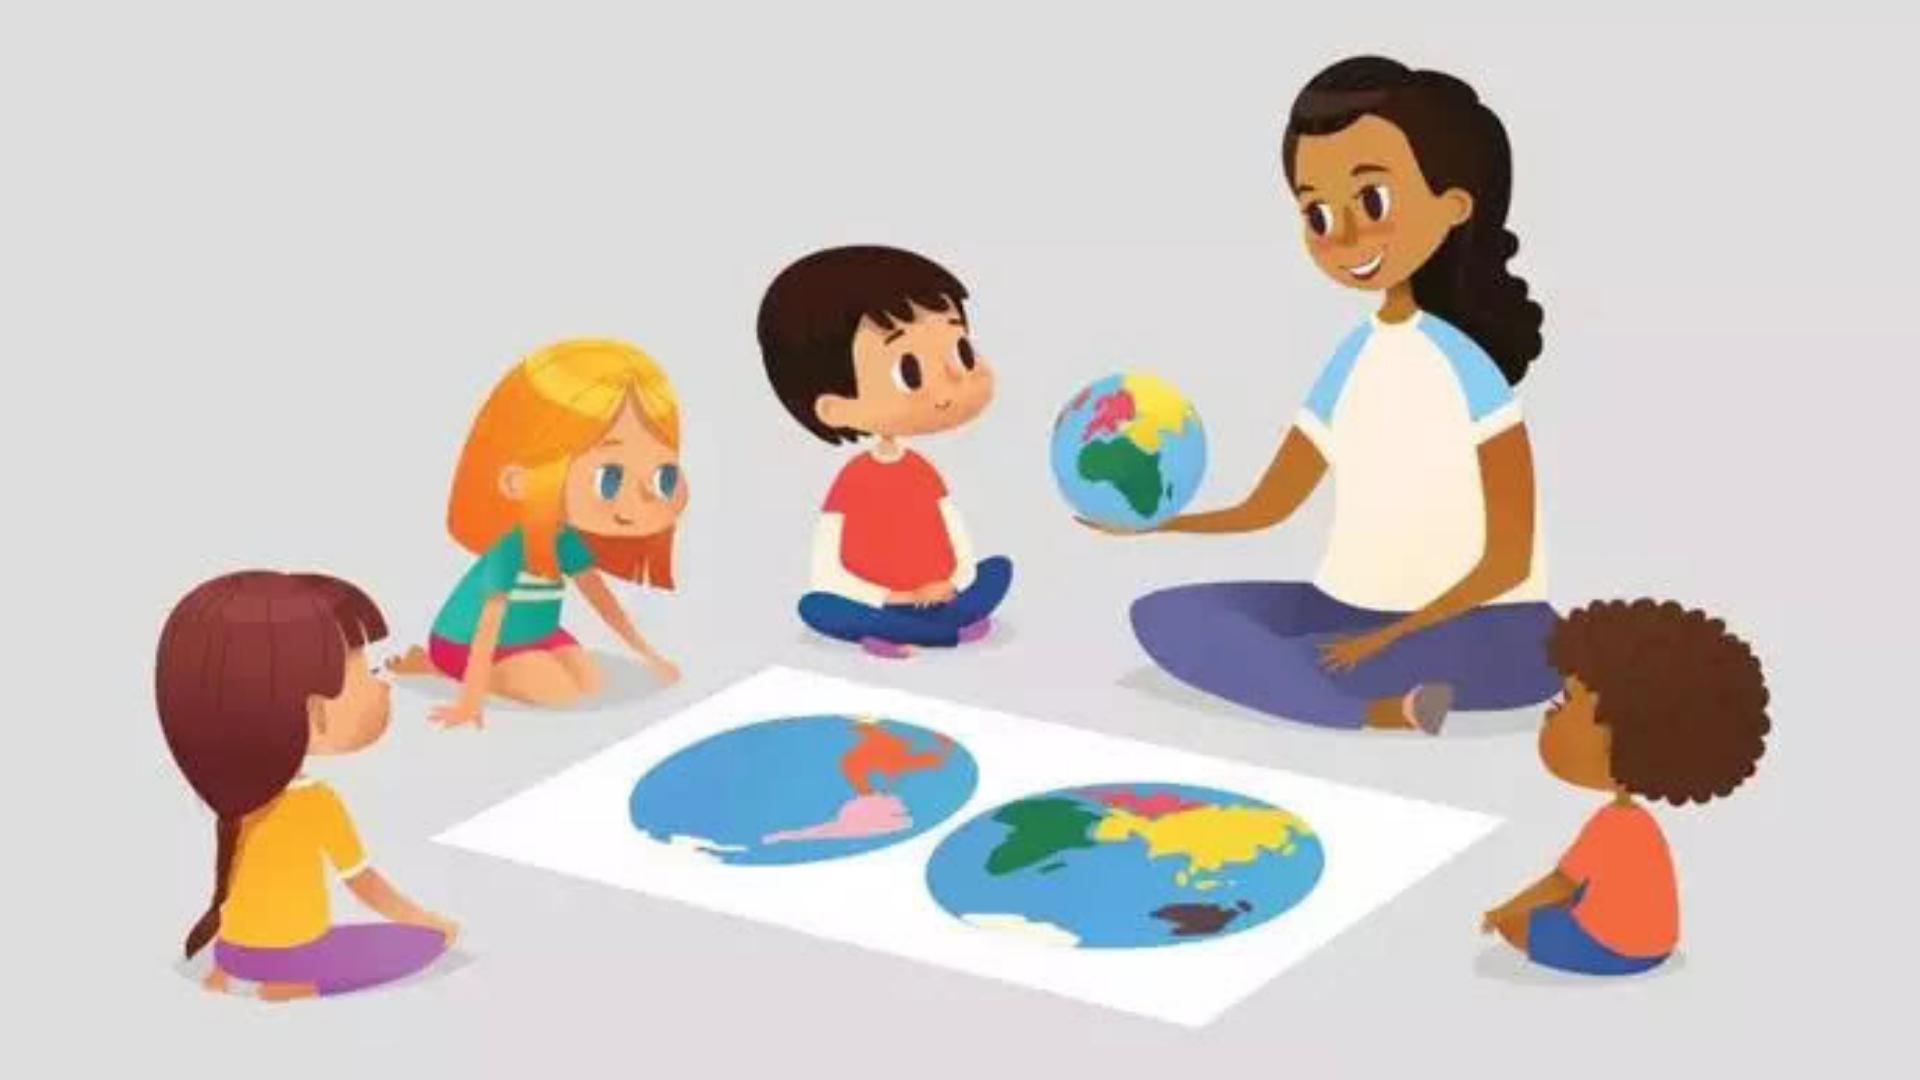 Click to view Montessori circle time videos